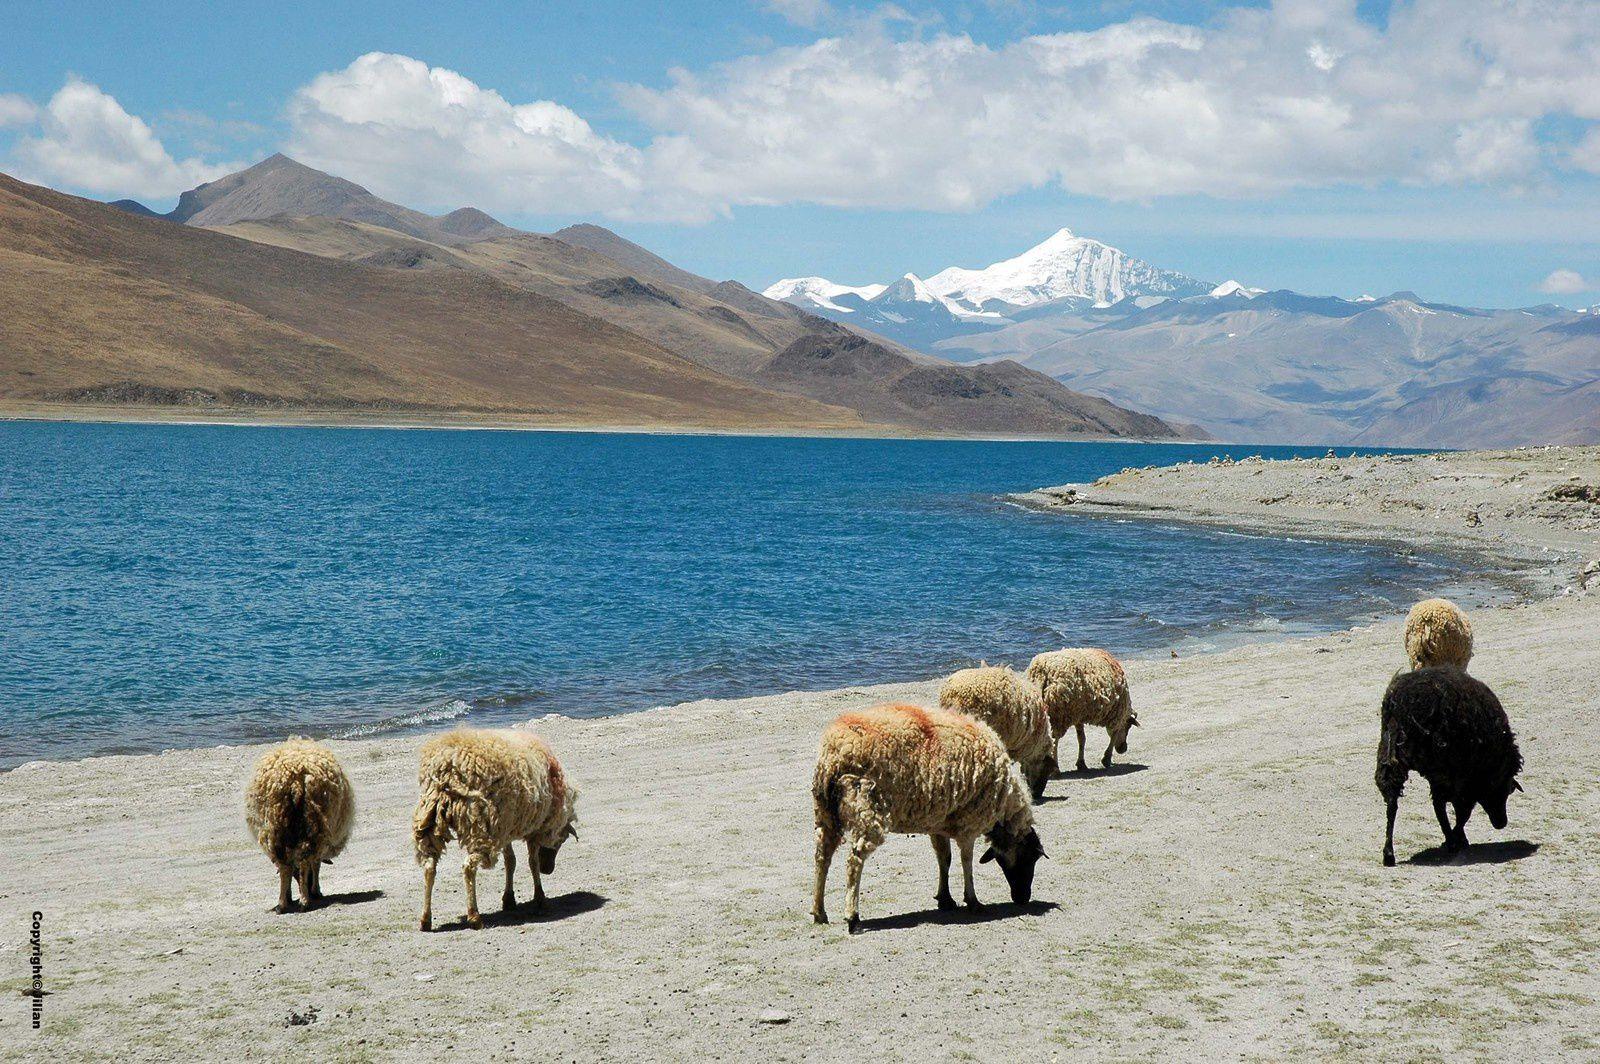 Tibet (7 et fin) : hommage au yack - 西藏 (第七章和结束)  :向牦牛表示敬意